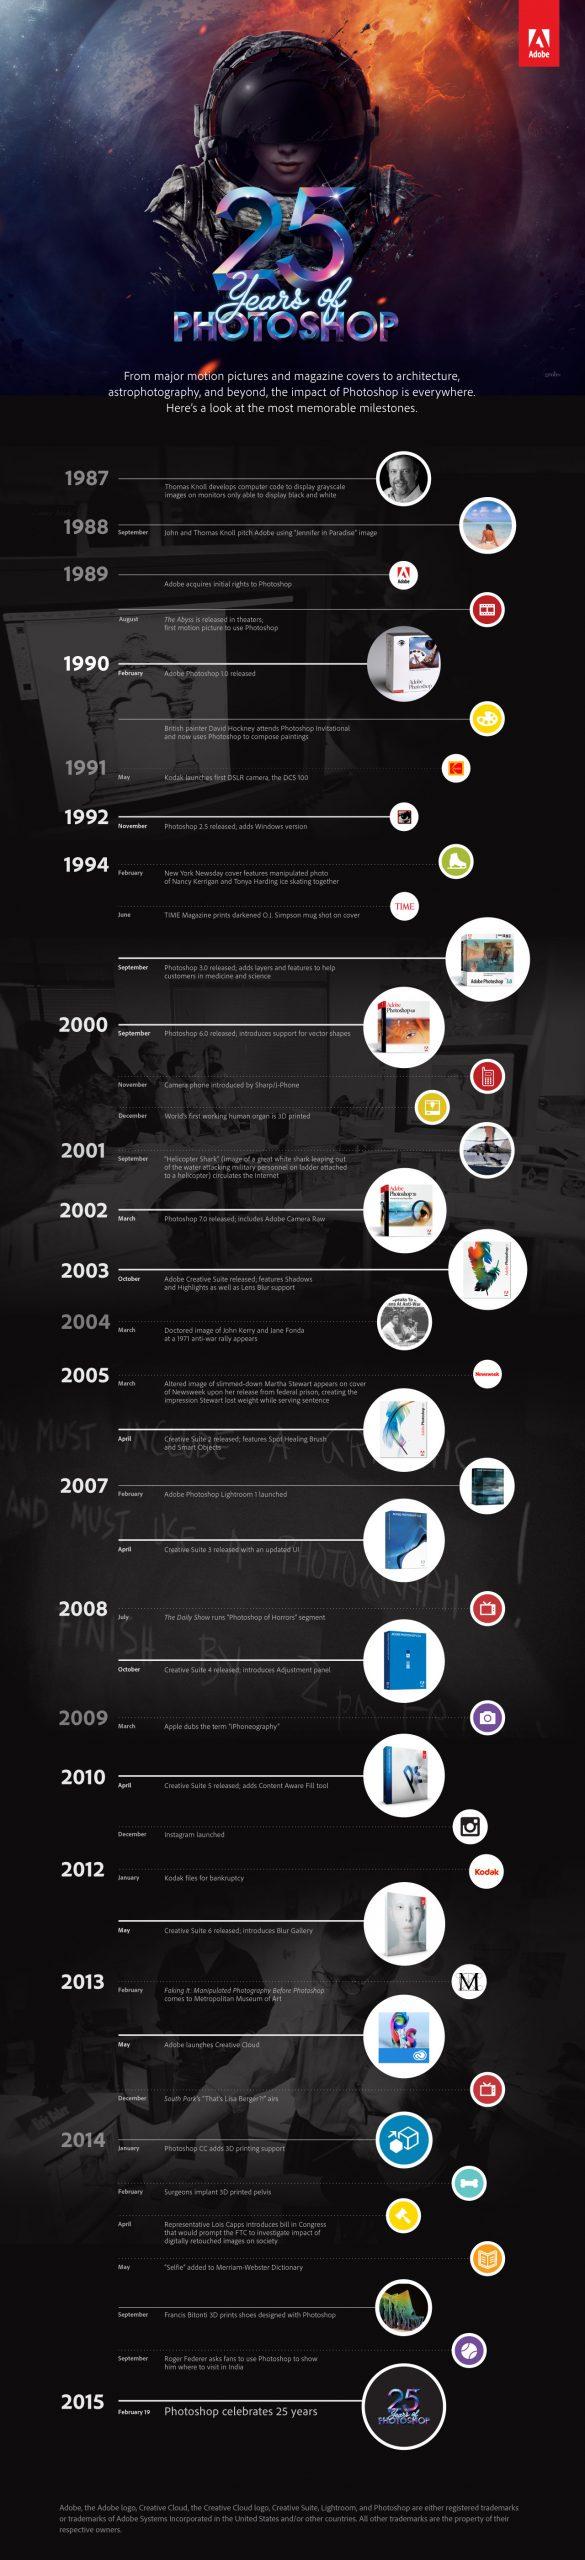 Photoshop 25th Anniversary Timeline